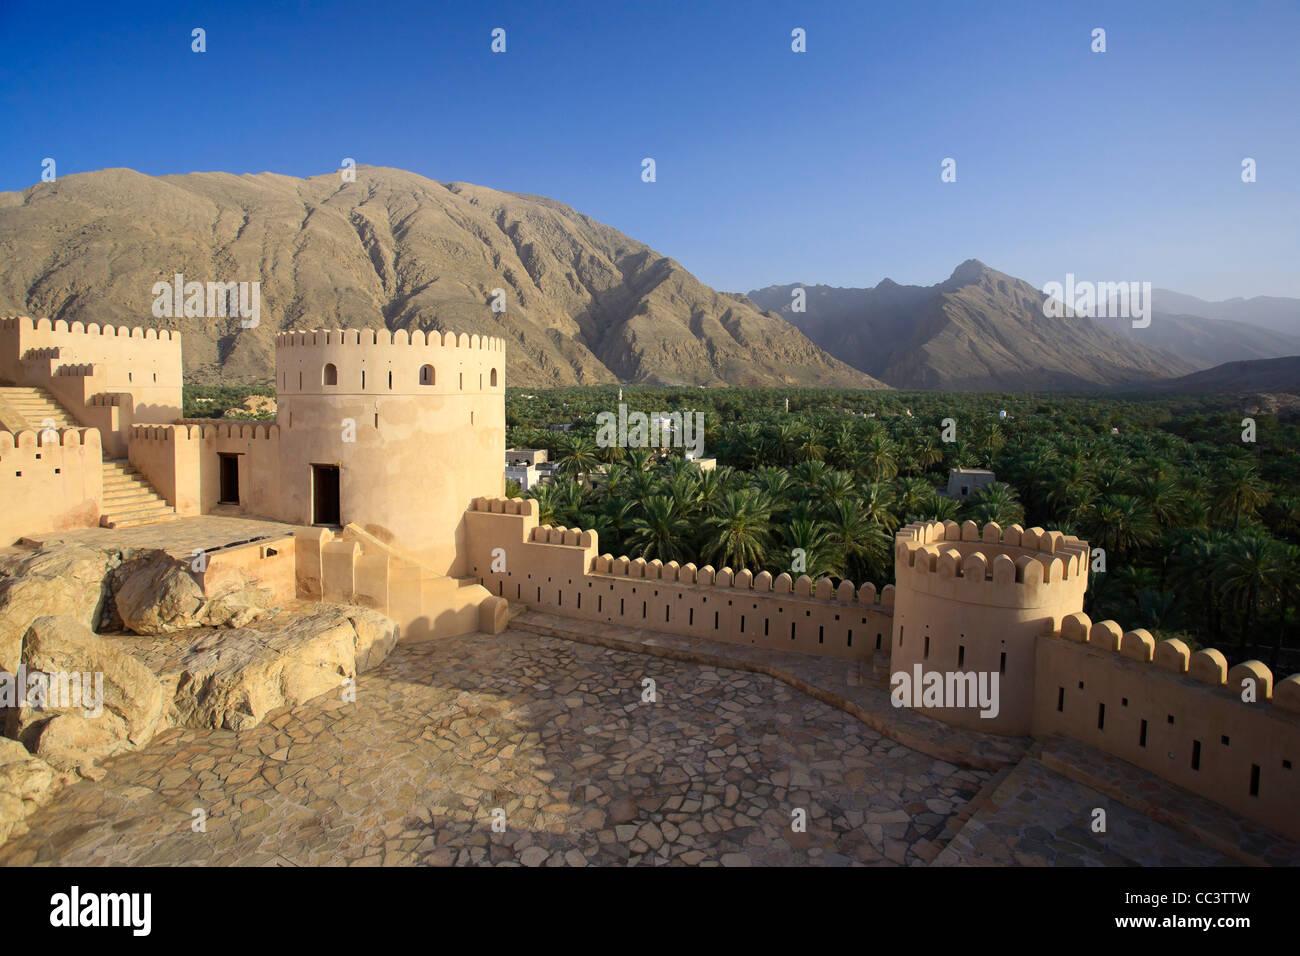 Oman, Nakhal Fort Nakhal, Photo Stock